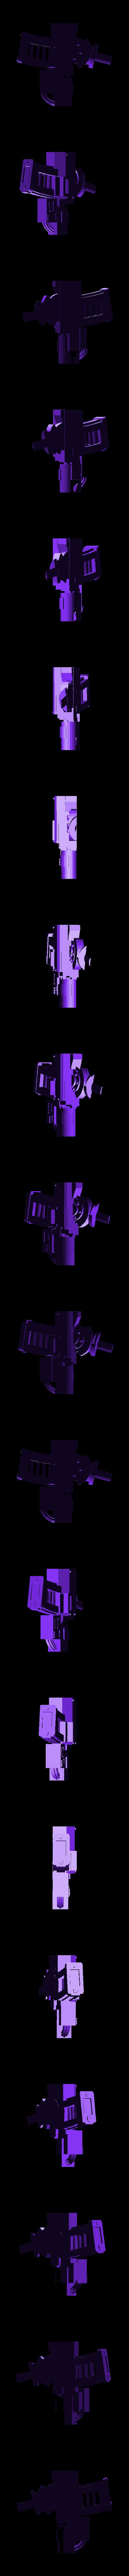 autocannon_side2.stl Download free STL file Robot Dread • 3D print template, Mazer